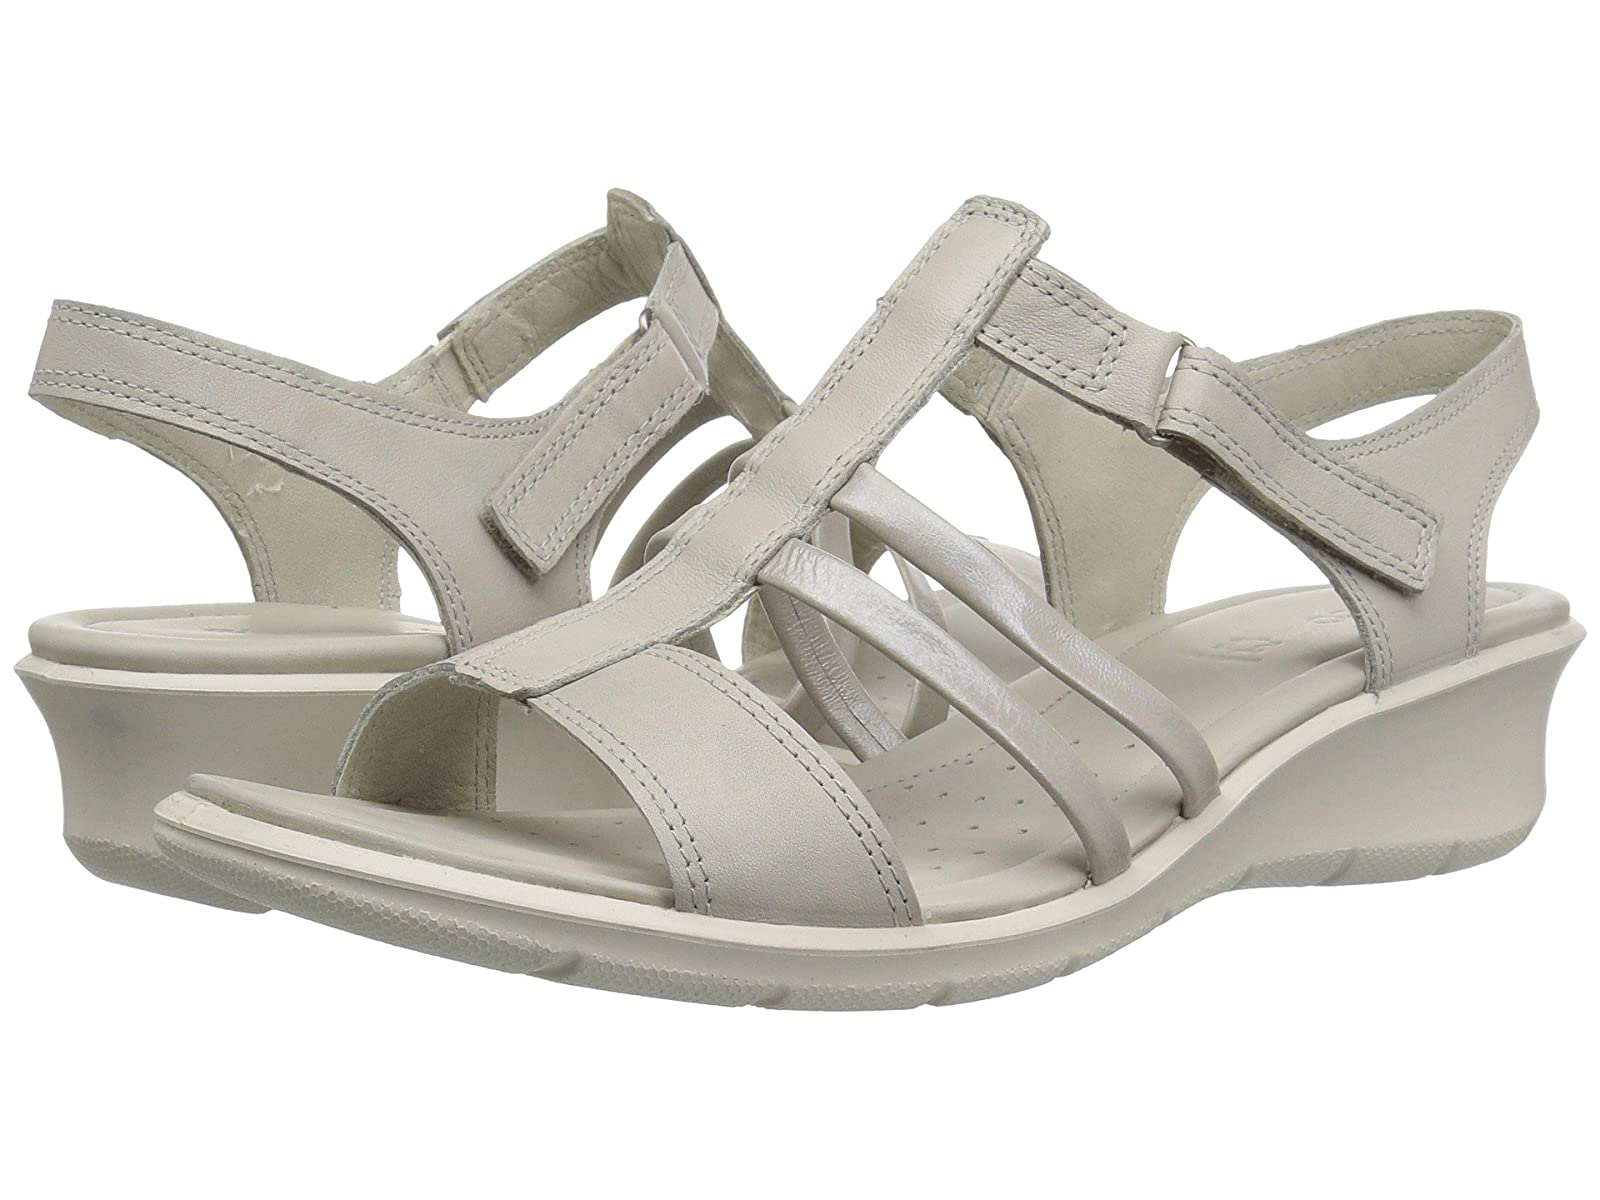 ECCO Felicia Ankle SandalComfortable and distinctive shoes